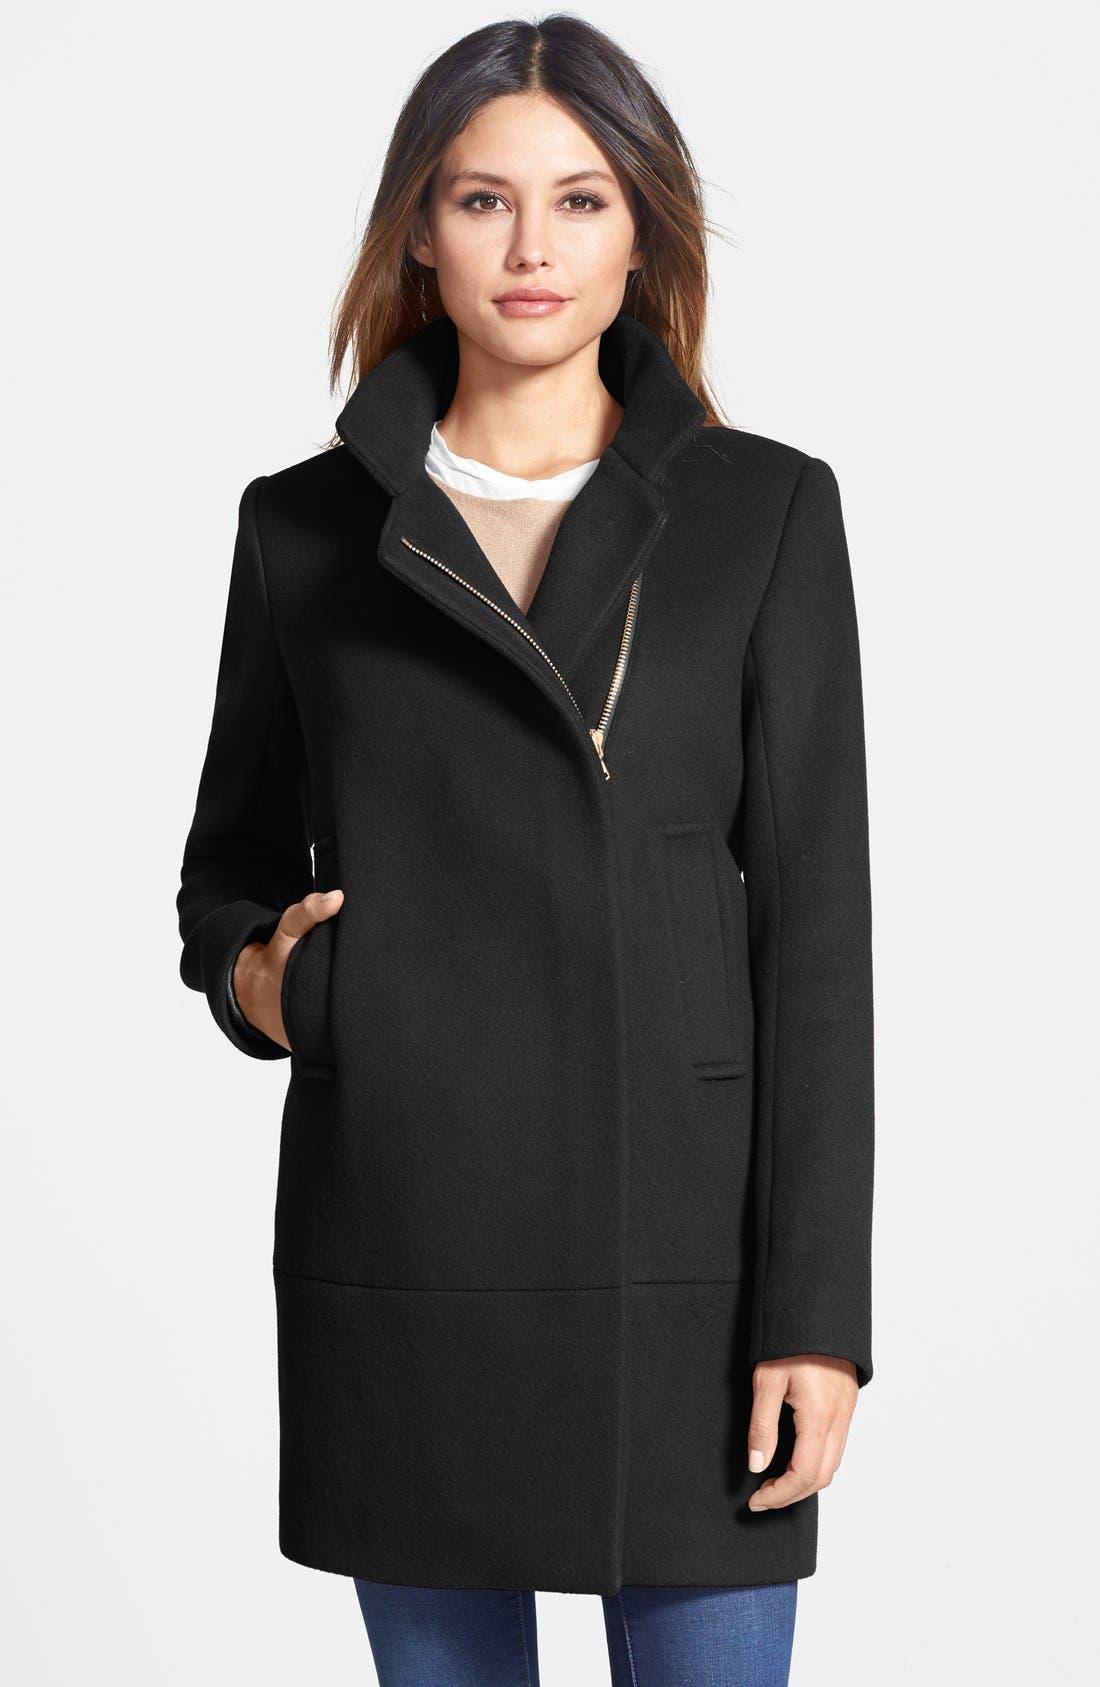 Alternate Image 1 Selected - Diane von Furstenberg 'Lauren' Asymmetrical Zip Wool Blend Coat